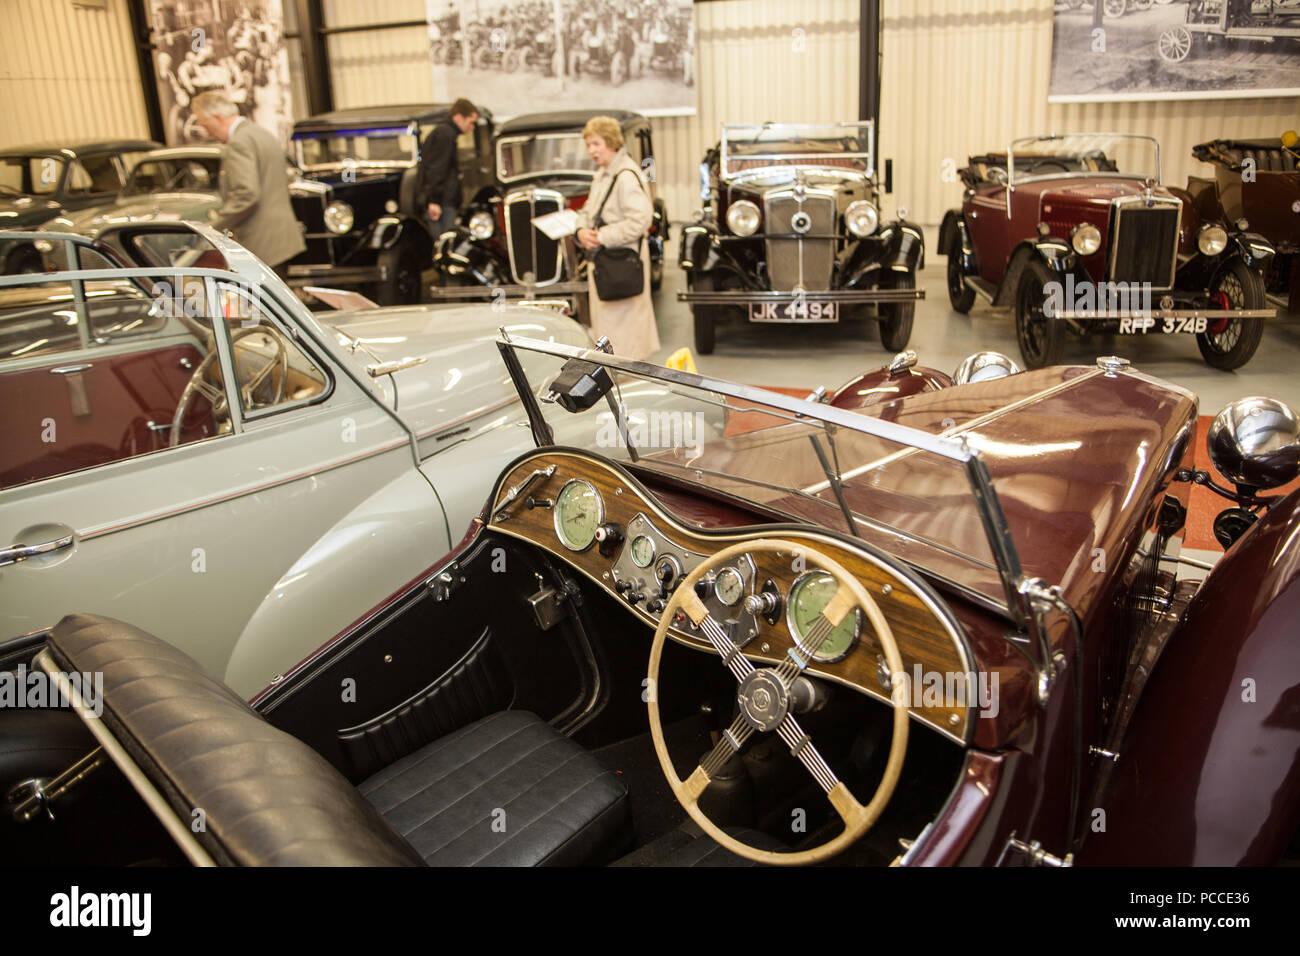 Haynes International Motor Museum Classic Car Cars Bikes Motorbikes